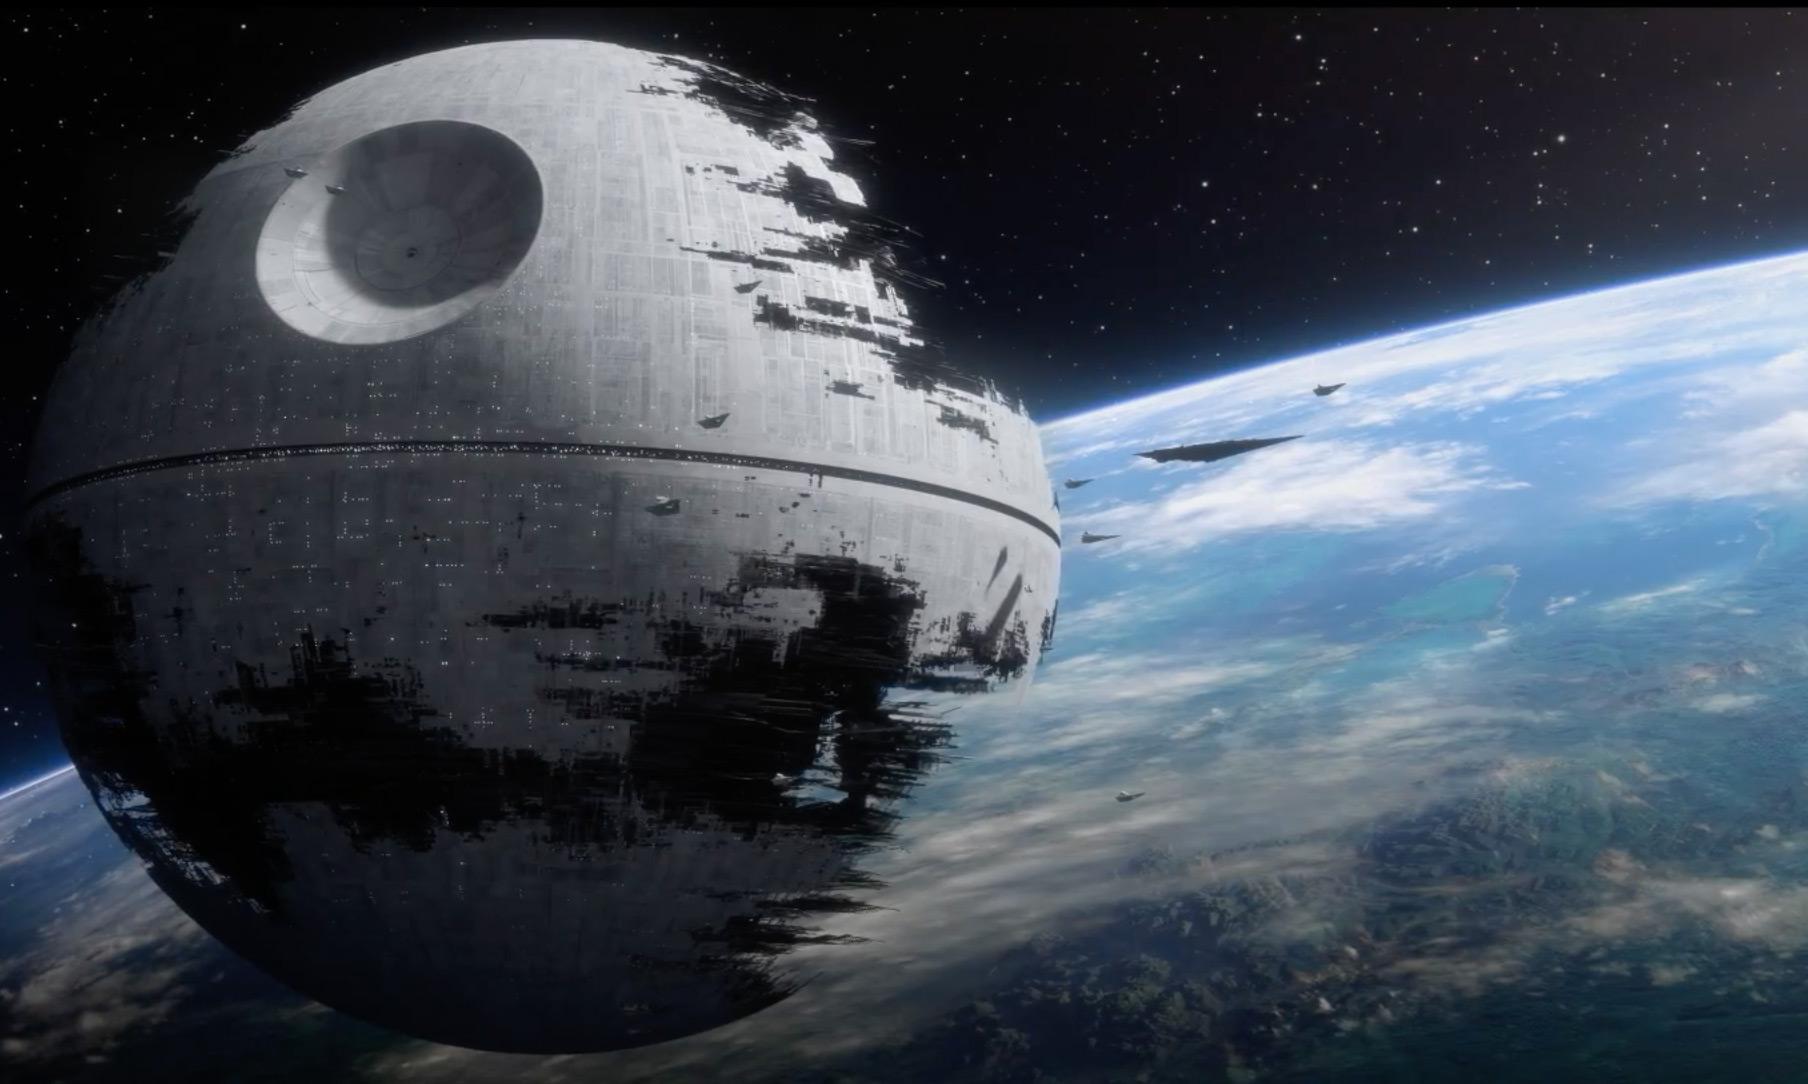 Watch the full trailer for Star Wars Battlefront II screenshot